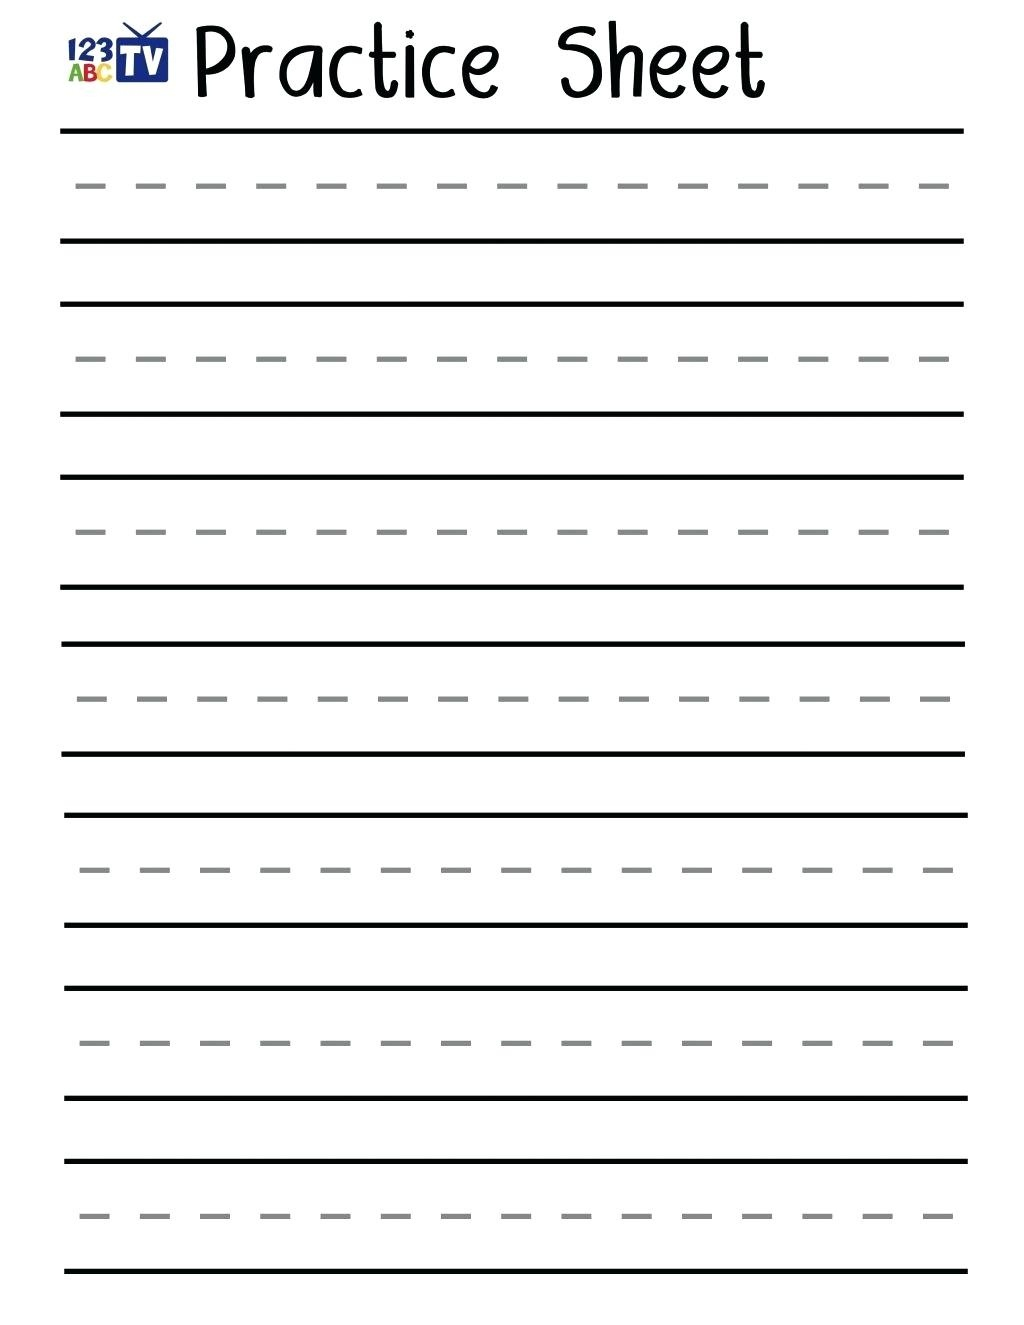 Practice Writing Sheets – Shoppingforu.club - Free Printable Handwriting Worksheets